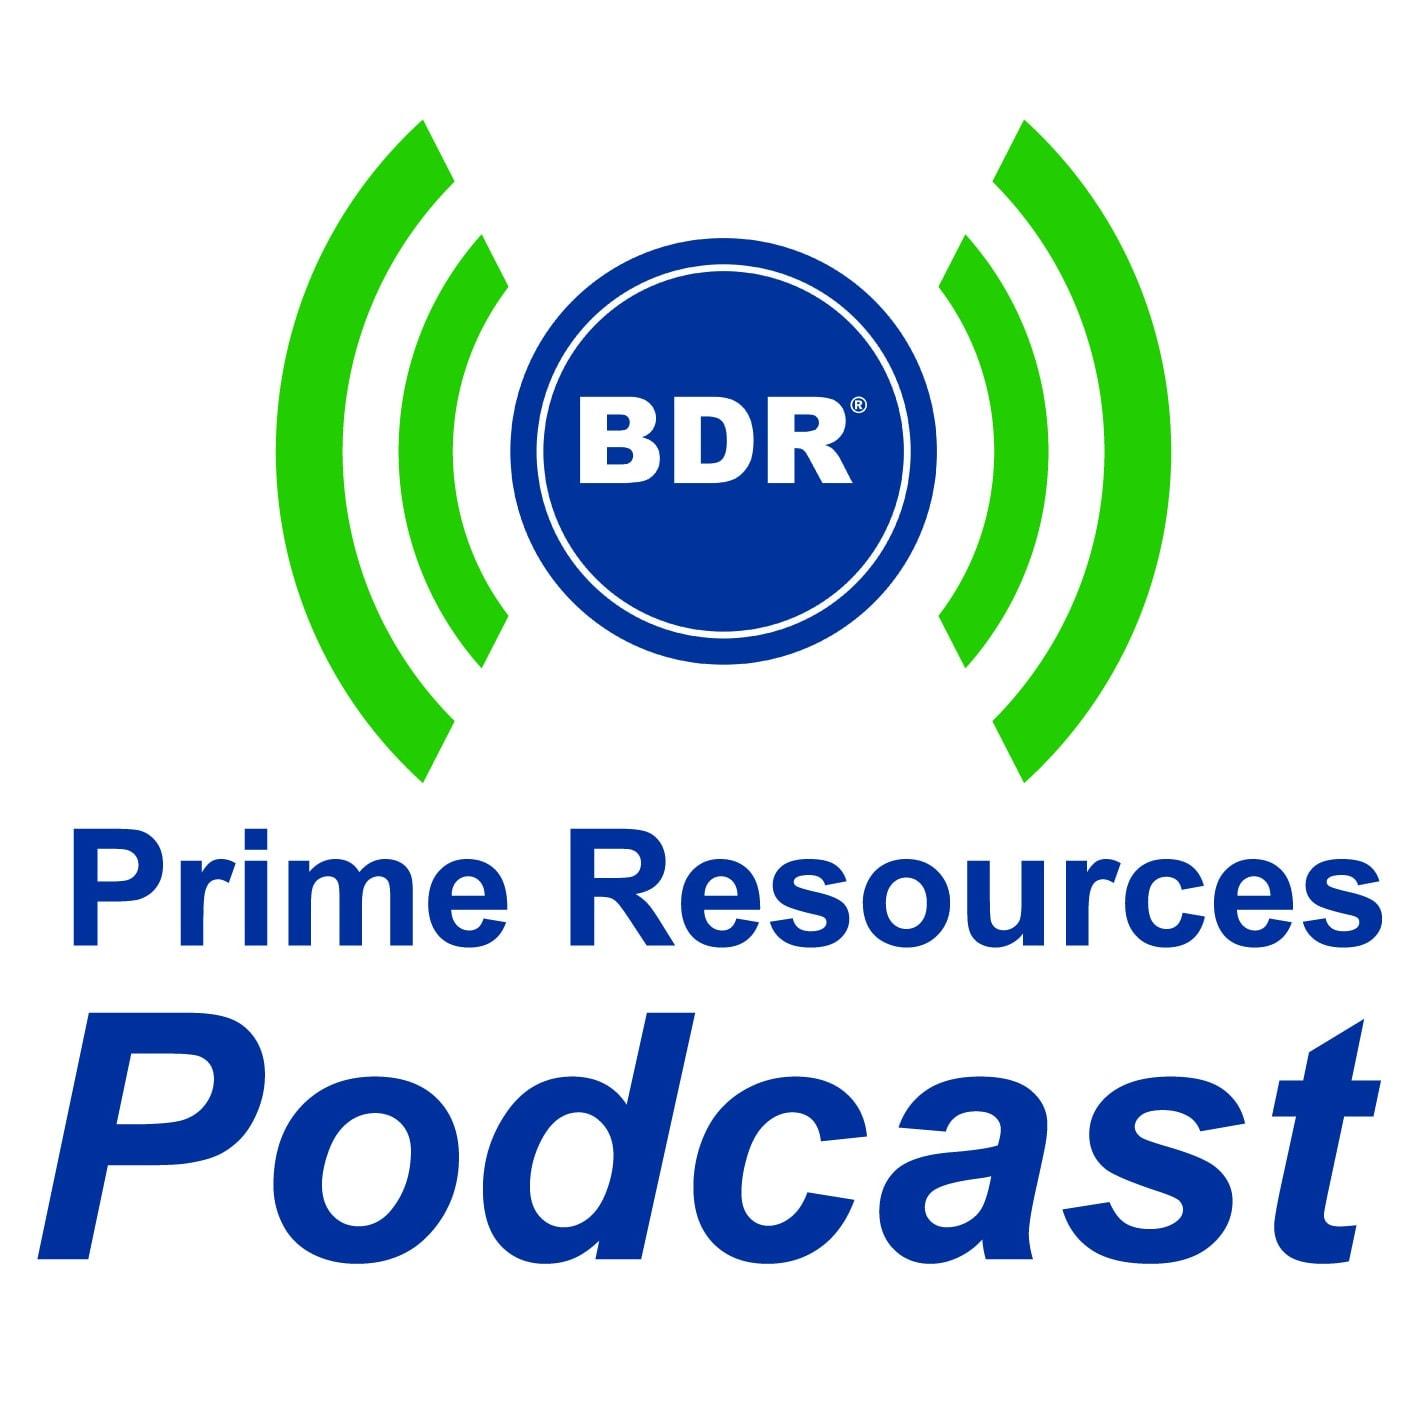 Prime Resource Podcast logo